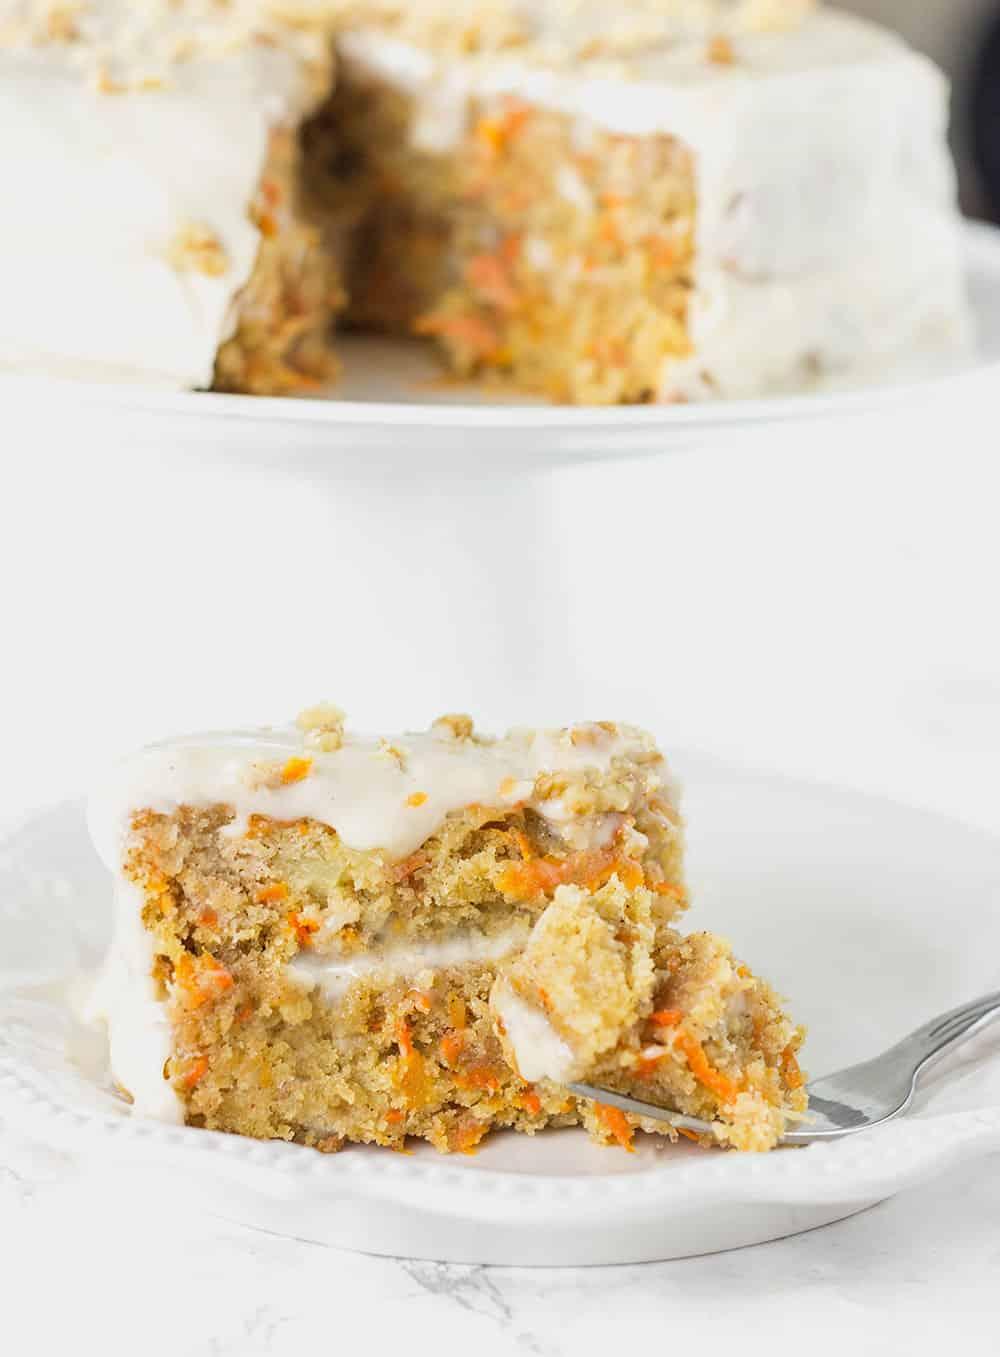 Vegan, Gluten-Free Carrot Cake